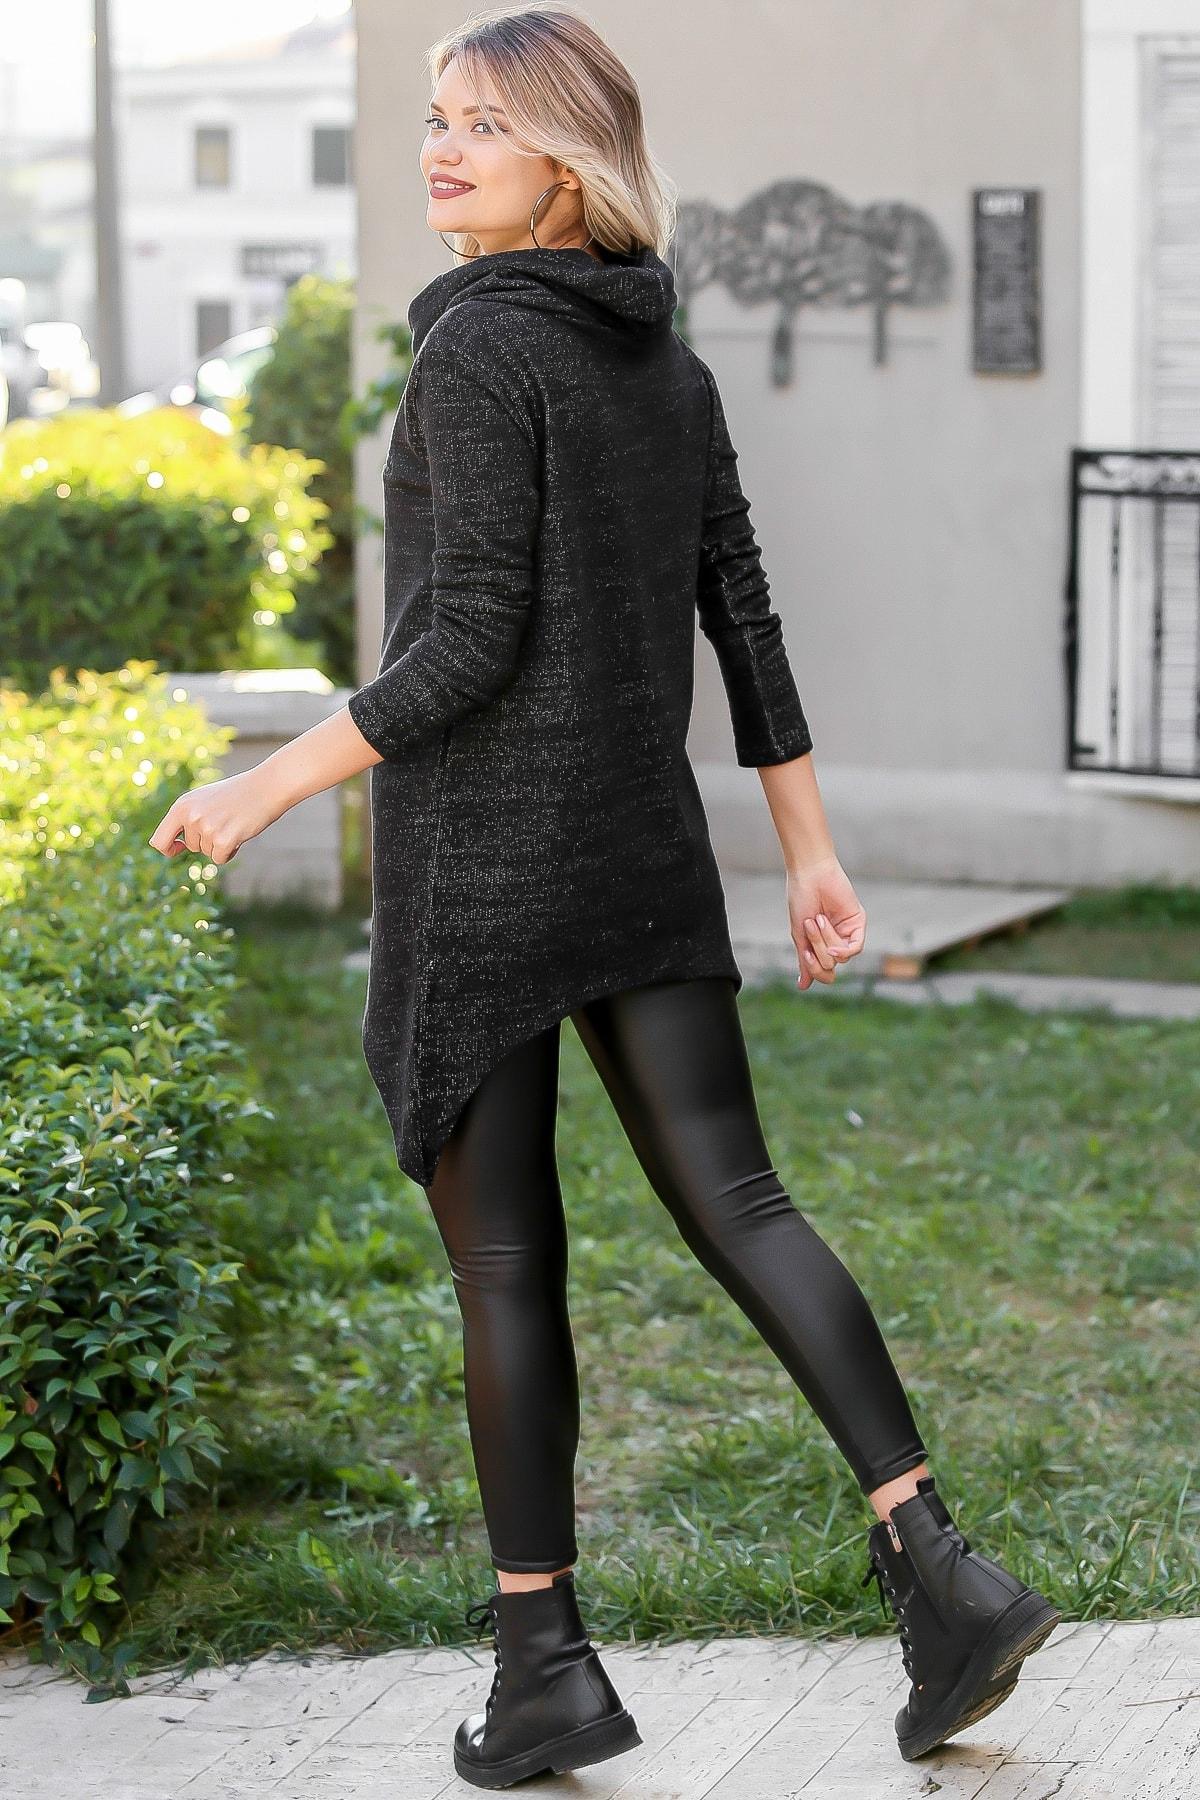 Chiccy Kadın Siyah Bohem Dev Boğazlı Anvelop Fermuarlı Dev Cep Detaylı Sweat M10010700SW99231 4